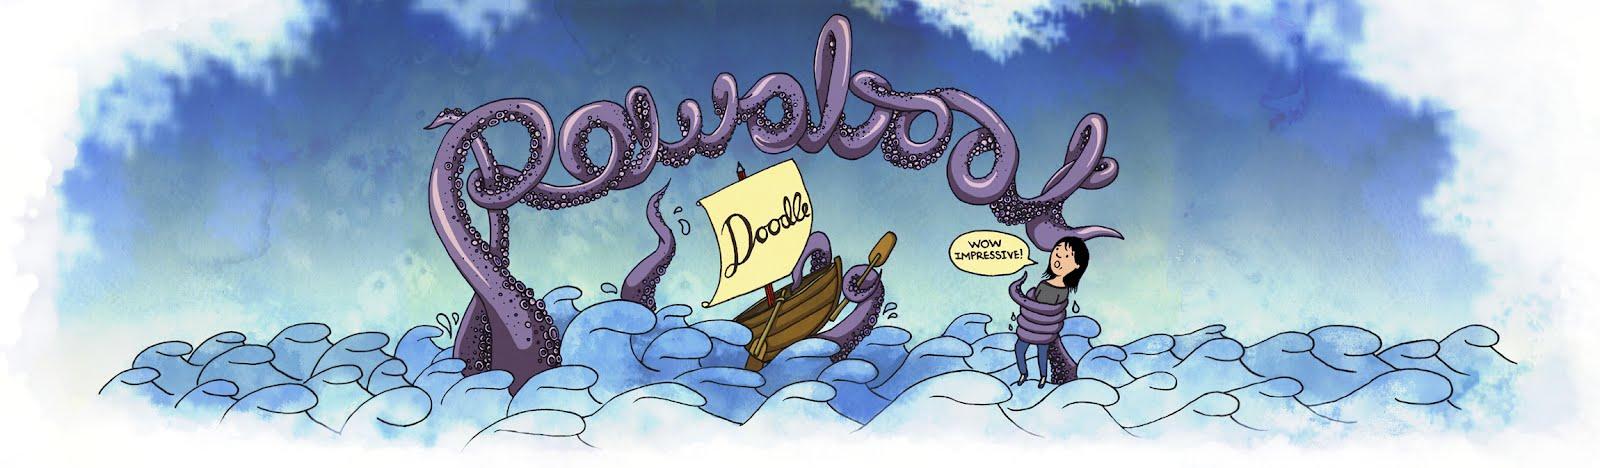 Rowaboat Doodle